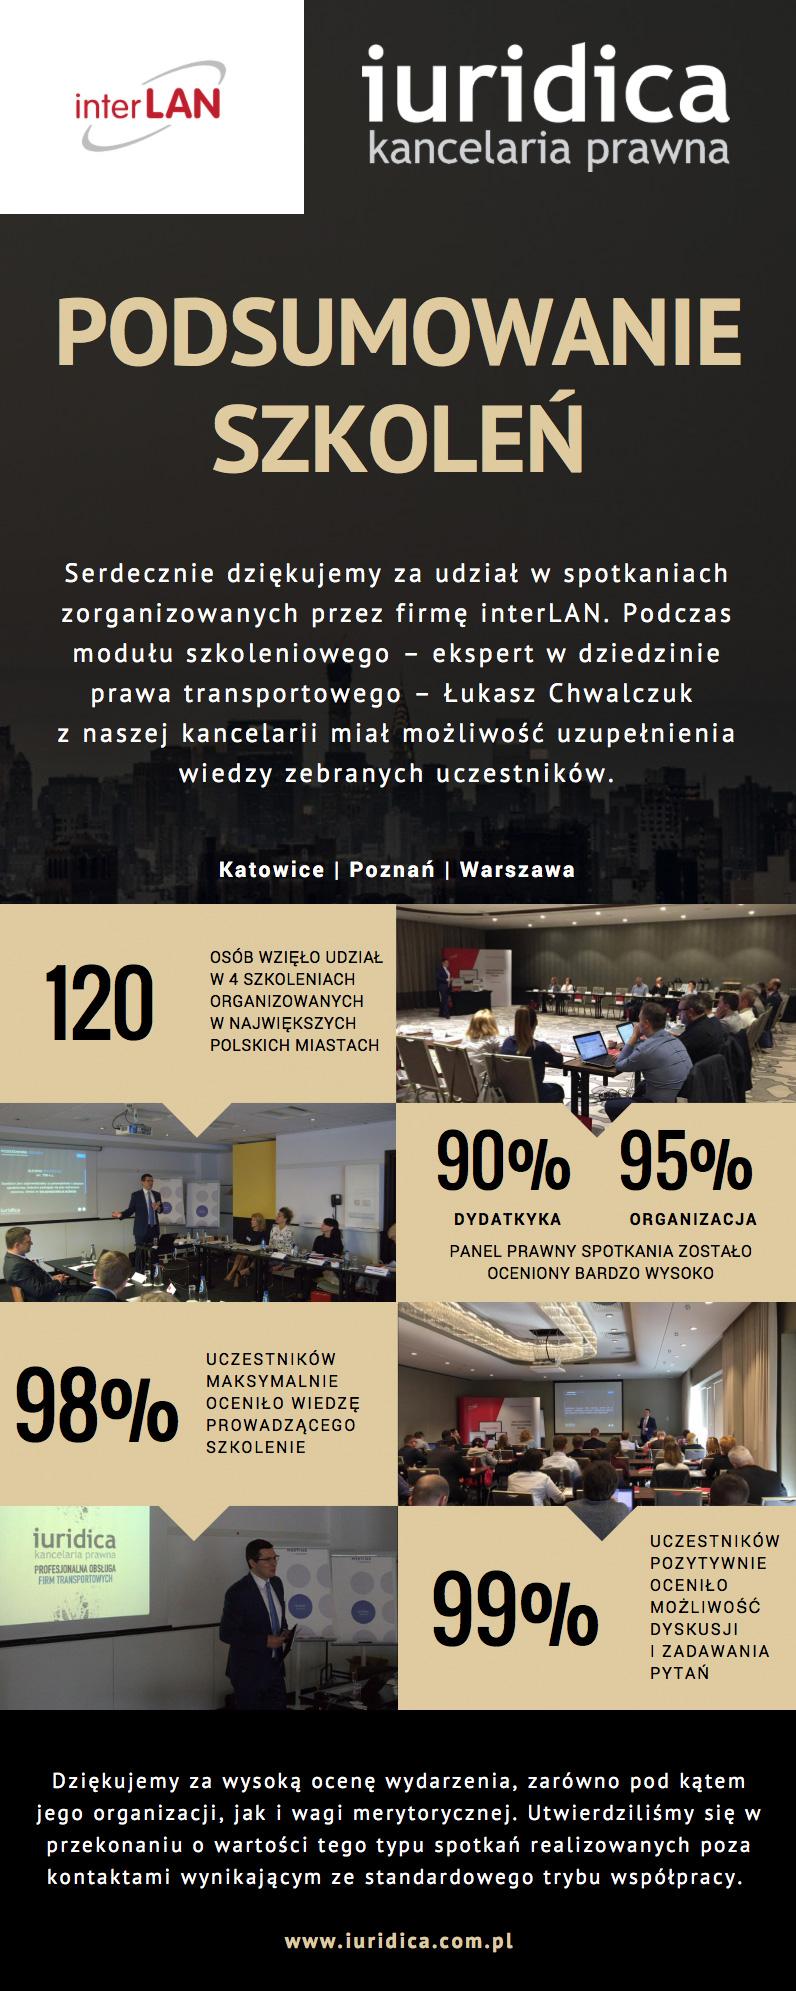 interlan-iuridica-infografika